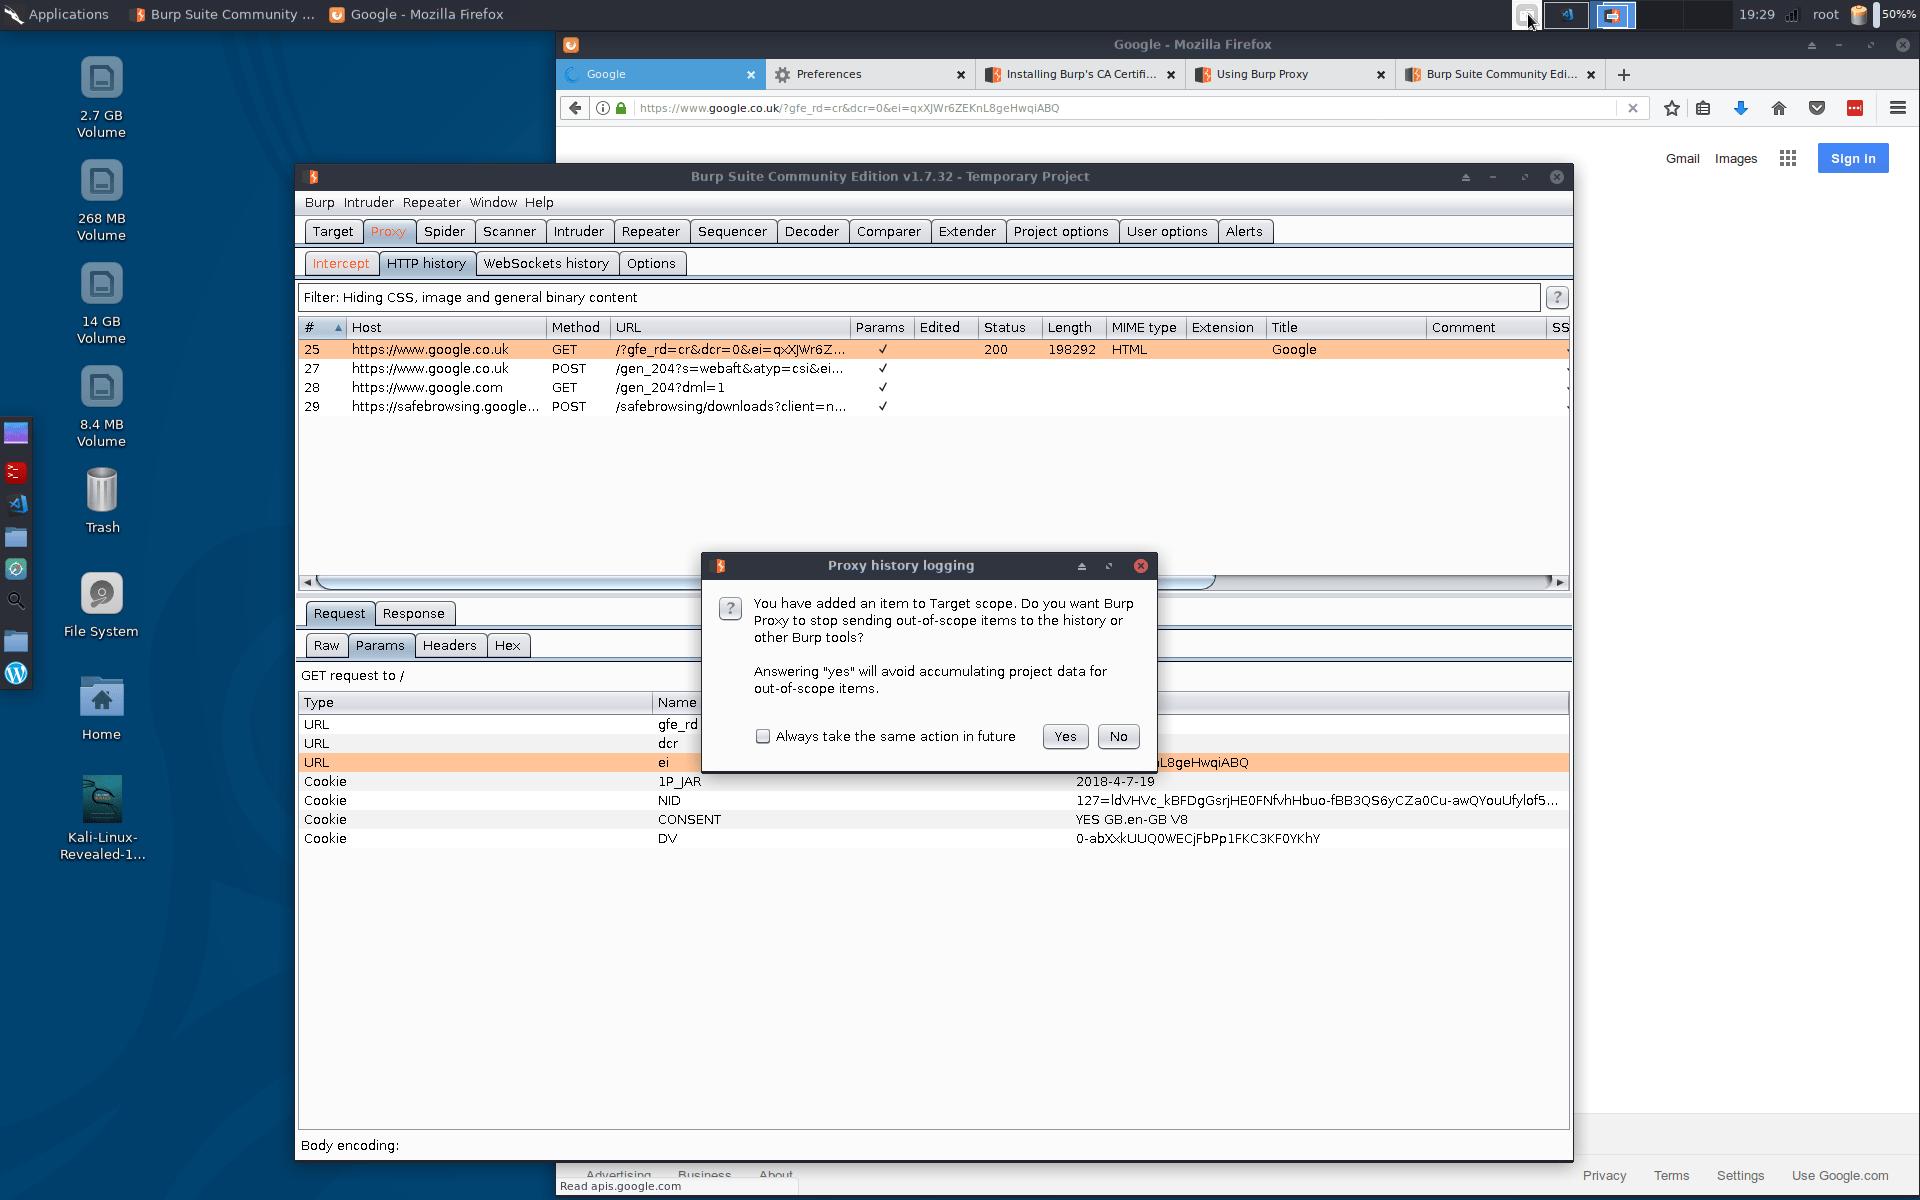 Screenshot_2018-04-07_19-29-18